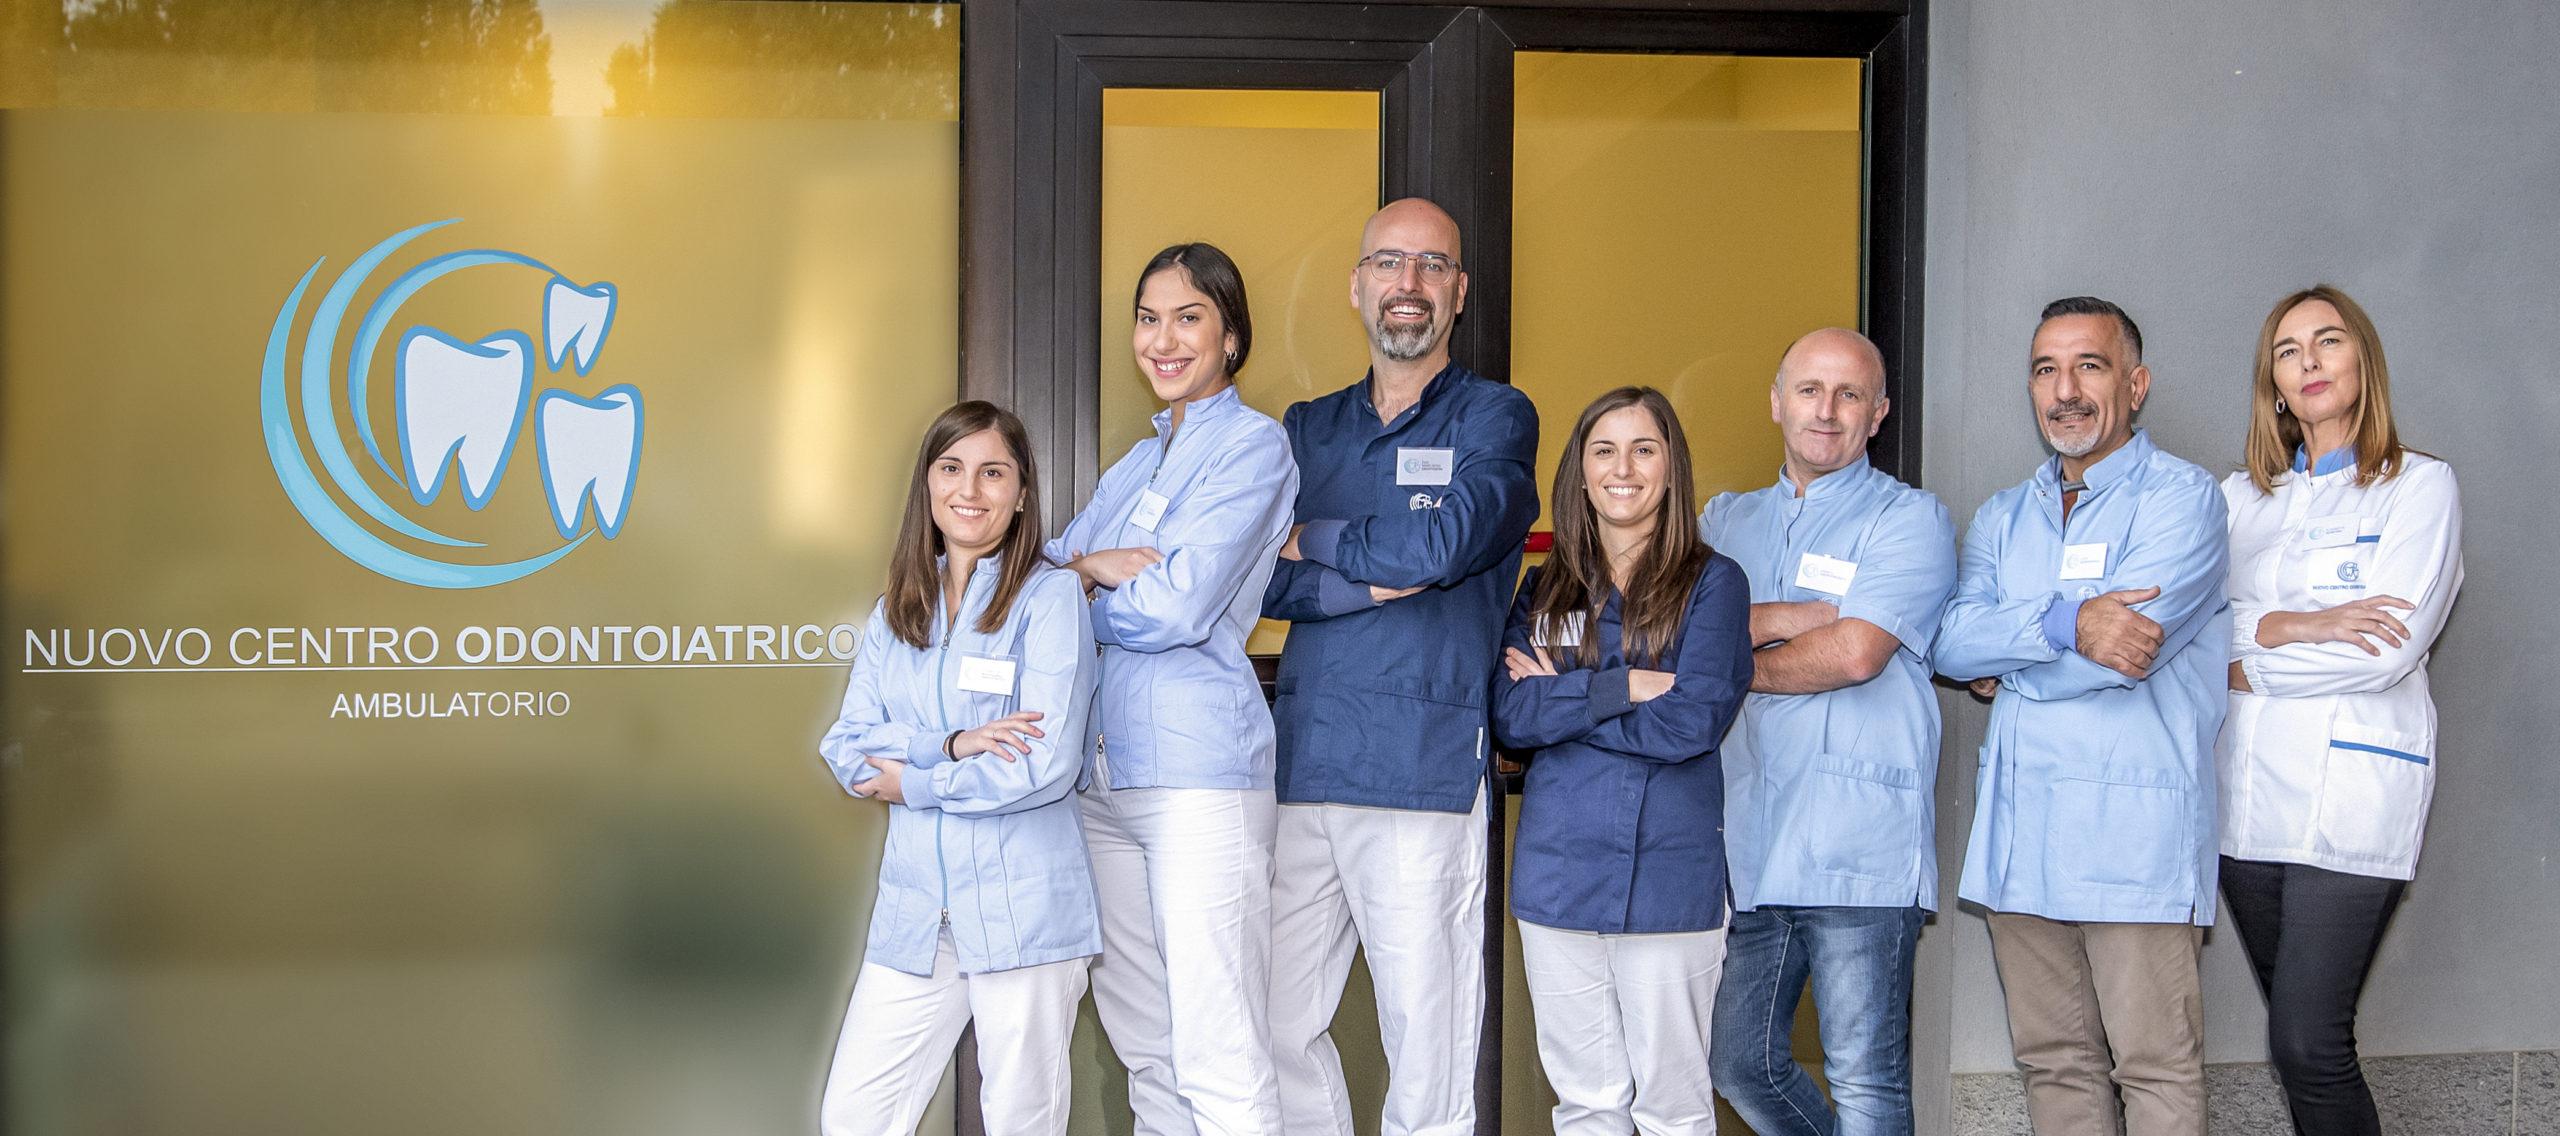 Nuovo Centro Odontoiatrico Todi